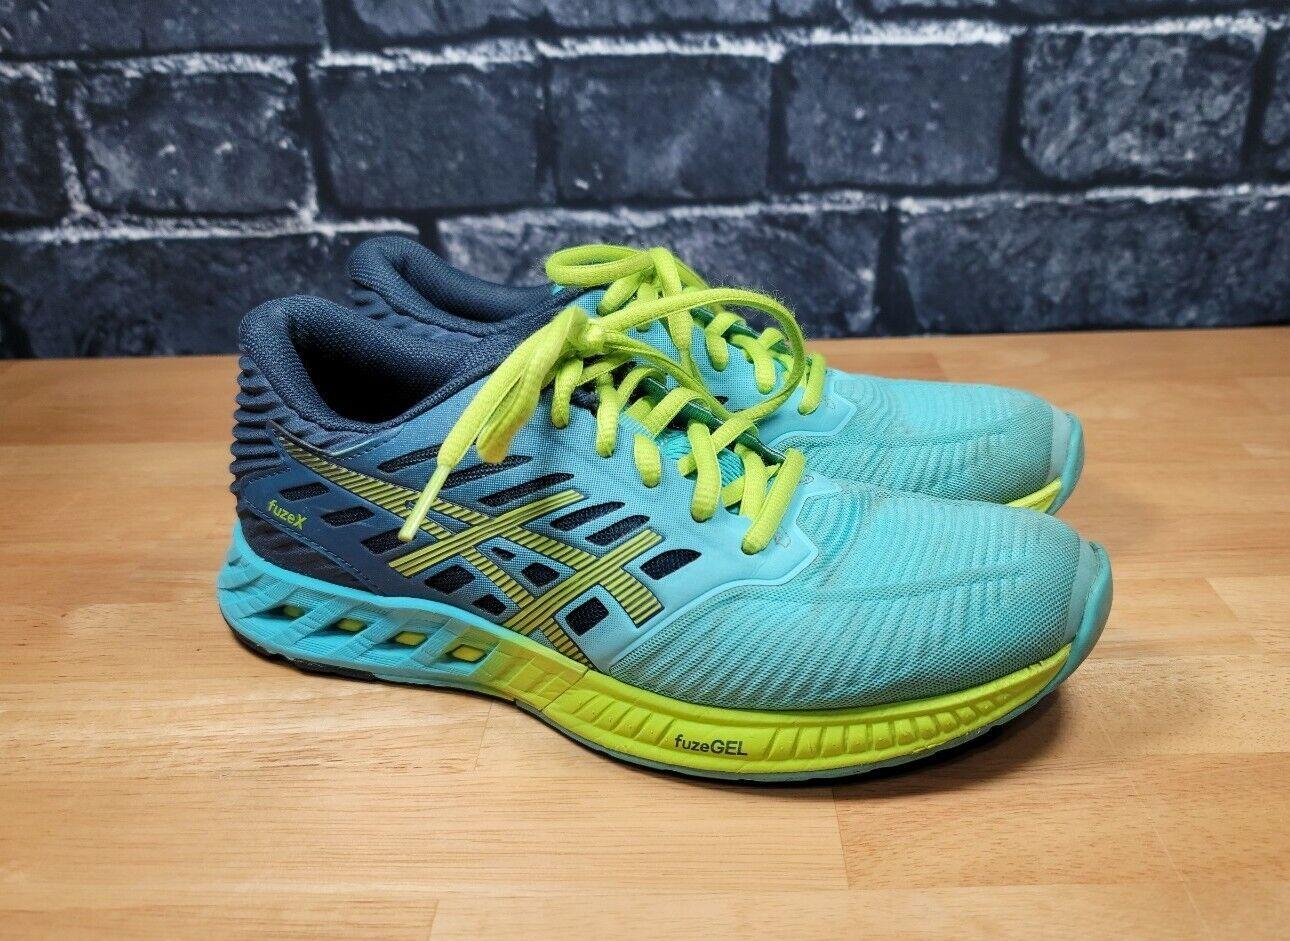 Asics FuseX (T689N) Running Shoes, Women's Size 6, Tu… - Gem